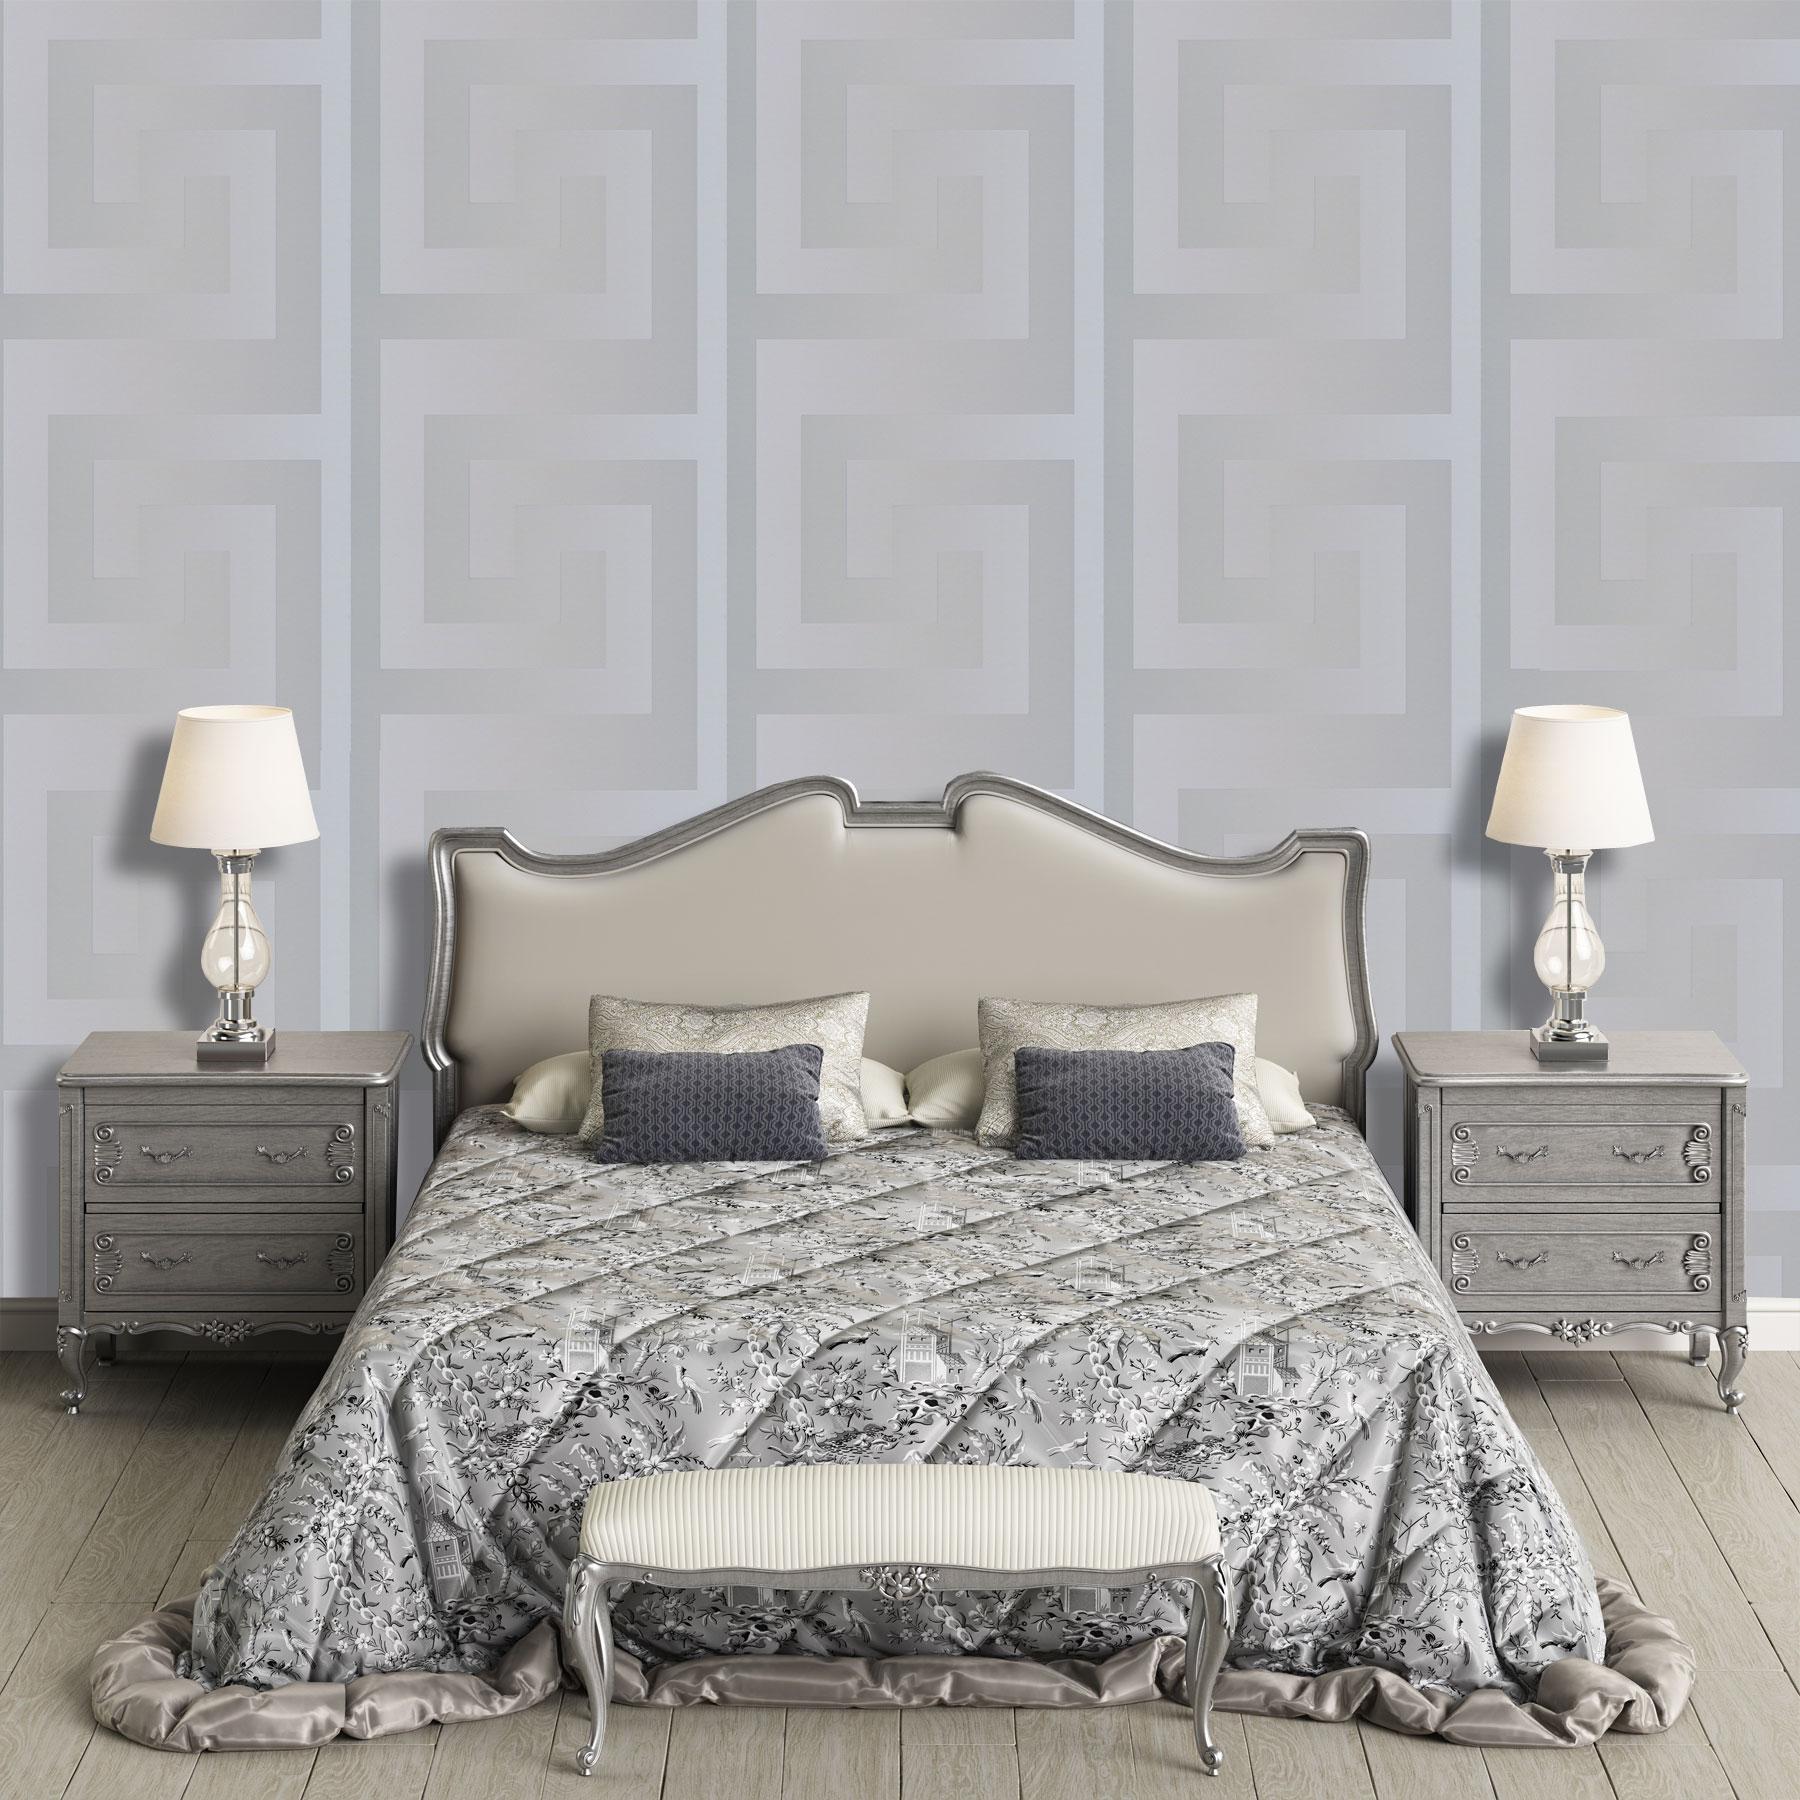 Silver Versace Wallpaper Designer Greek Key Luxury Modern Satin